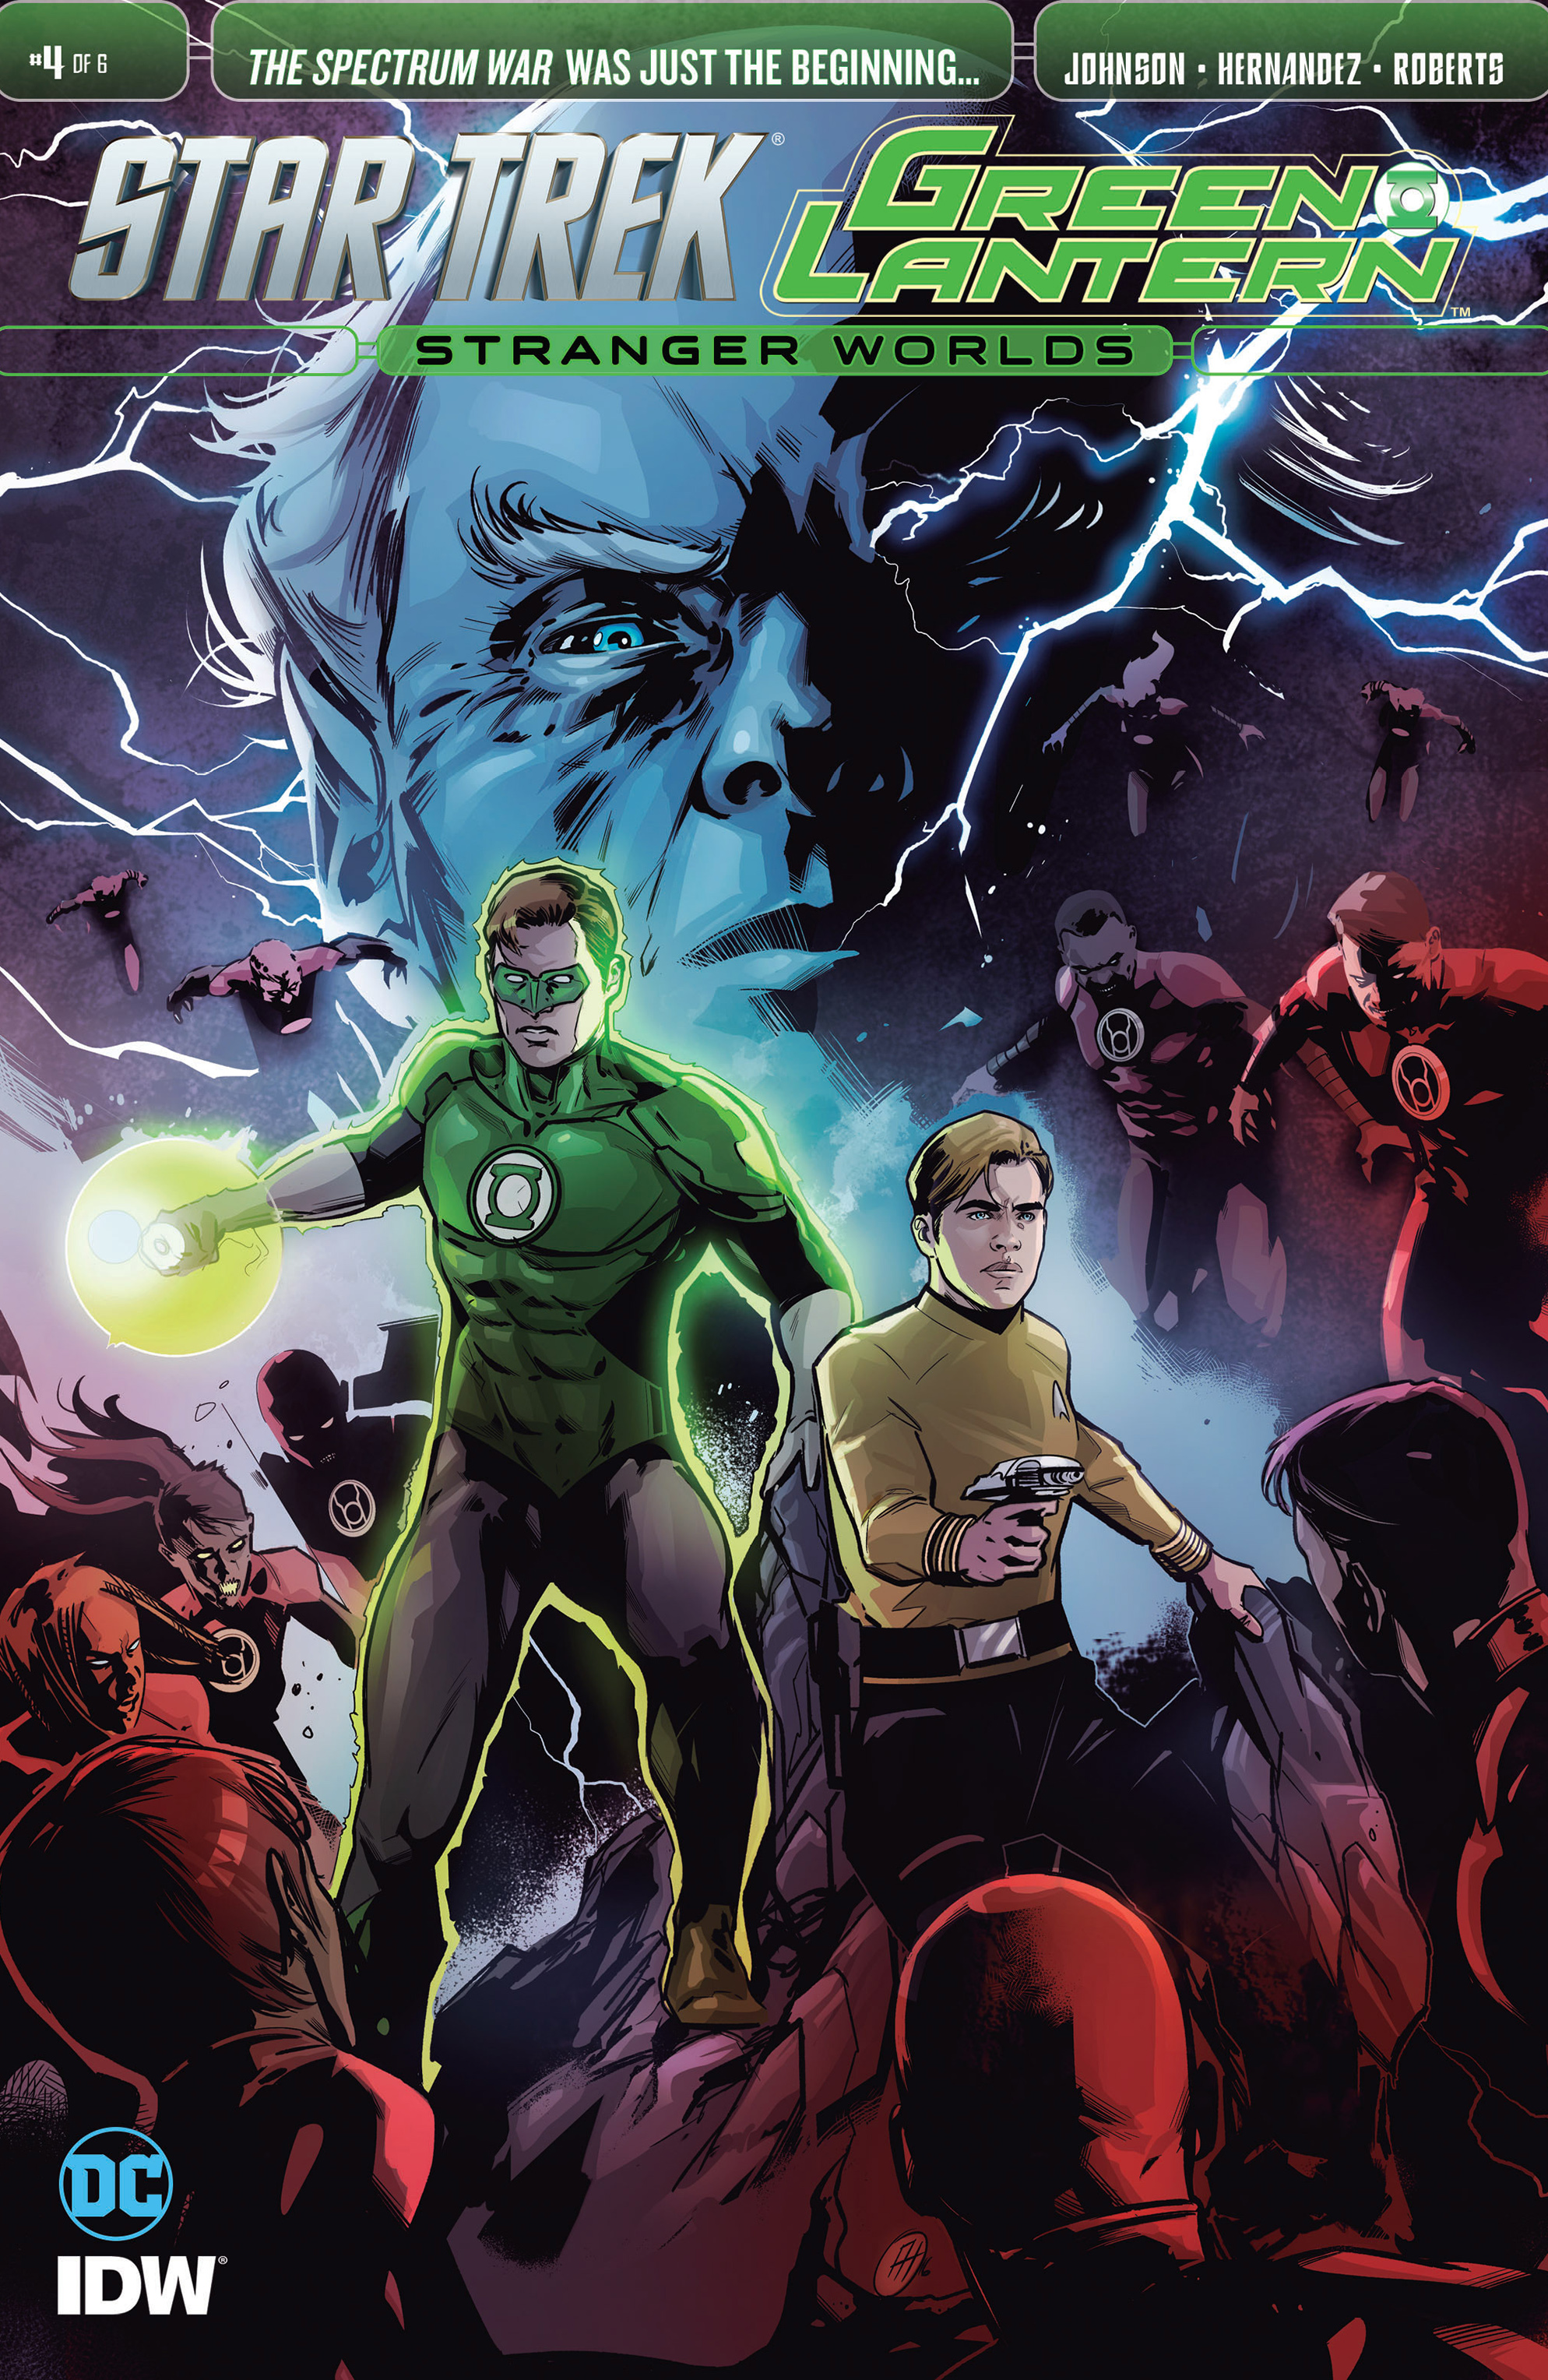 Star Trek/Green Lantern (2016) 4 Page 1